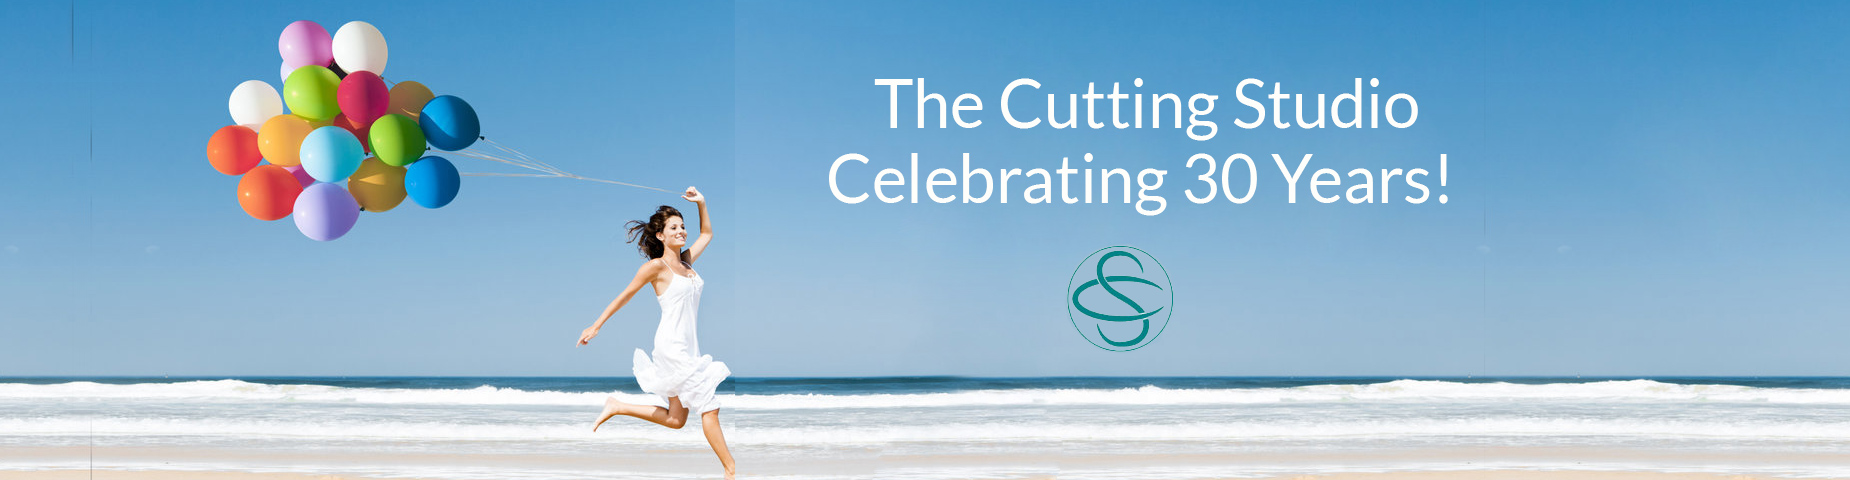 The Cutting Studio in Hazlemere  - Celebrating 30 Years!